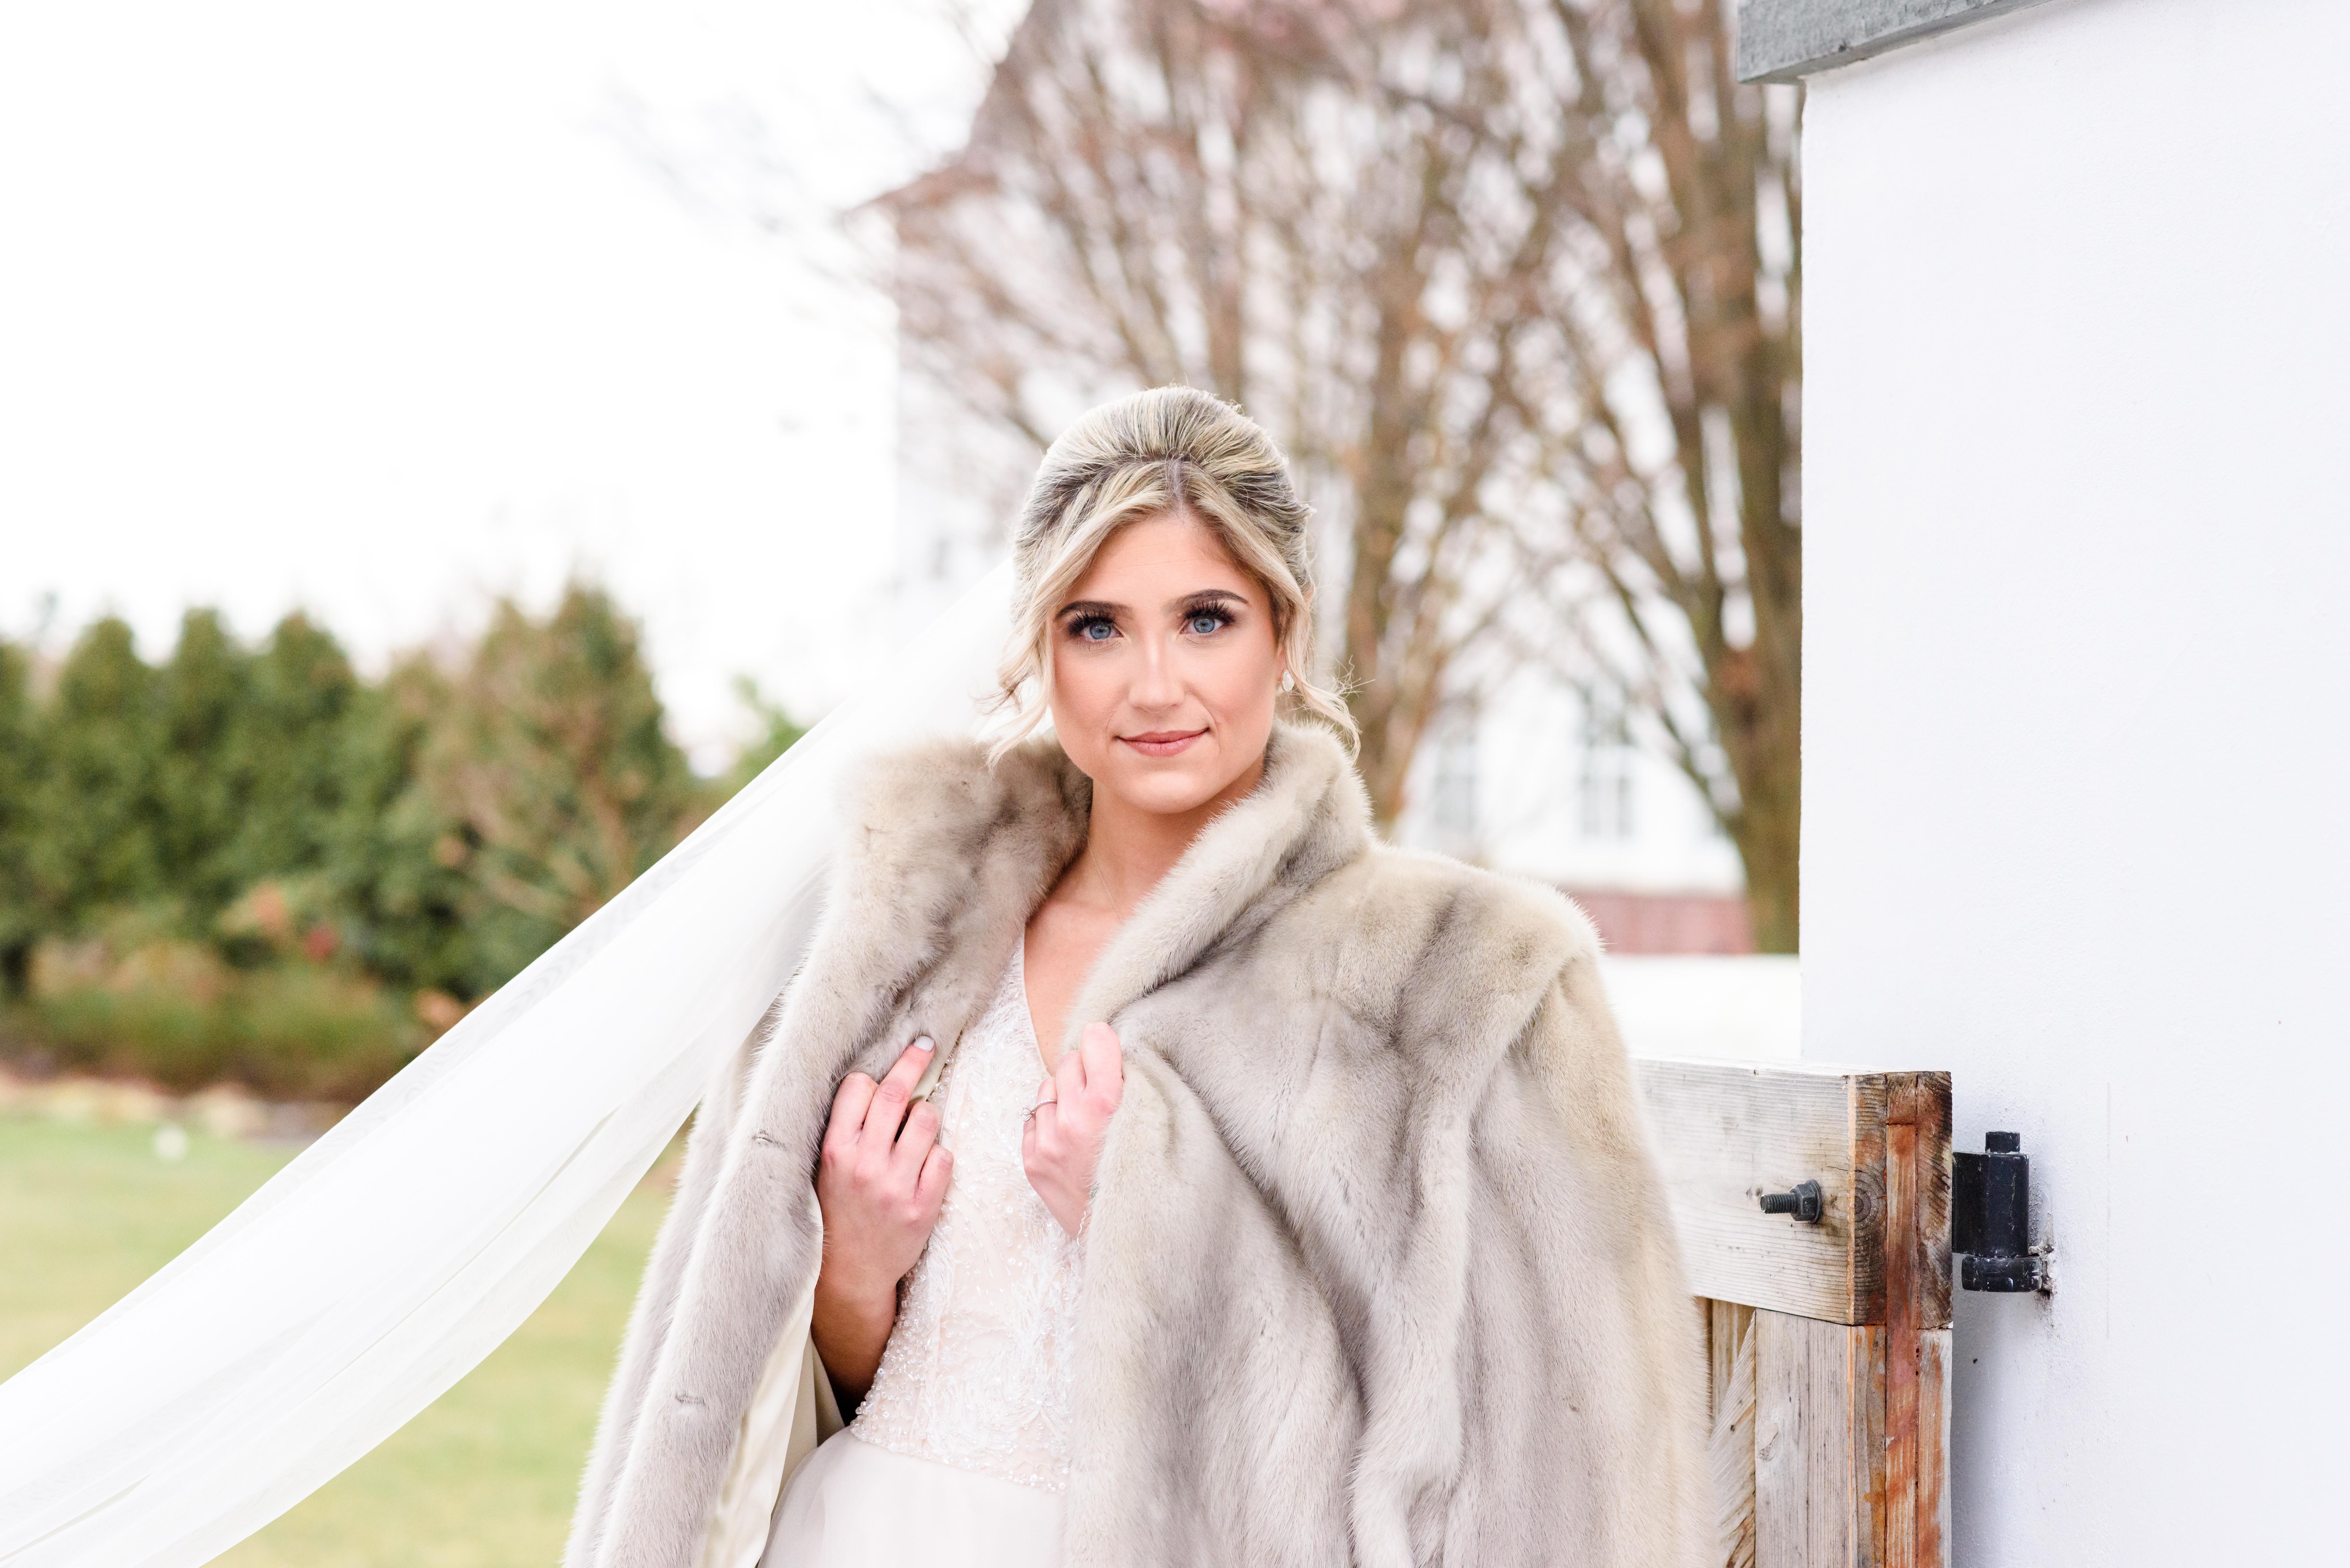 normandy-farms-wedding-andrea-krout-phot